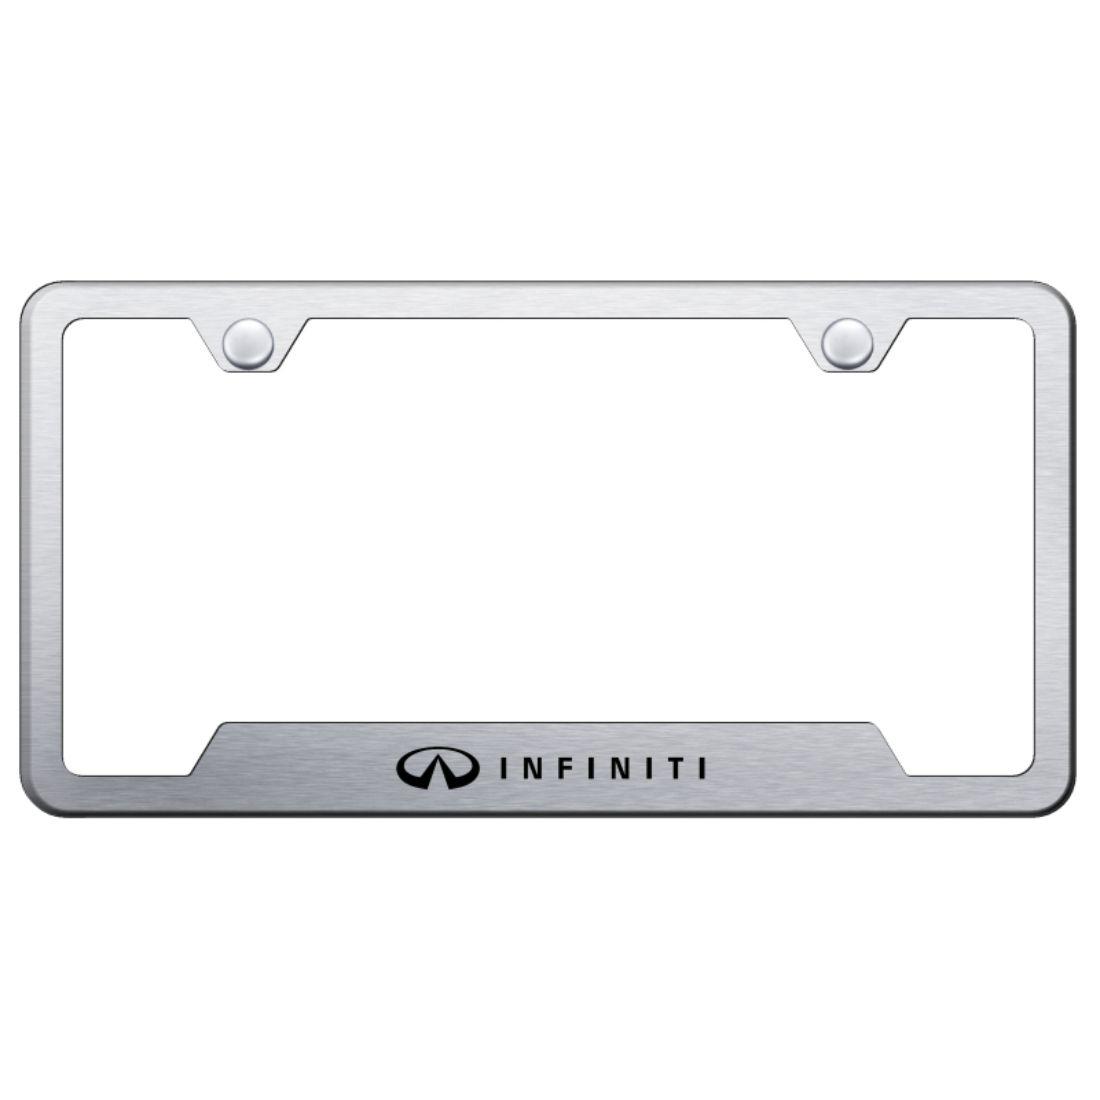 Infiniti Qx60 Black Stainless Steel License Plate Frame